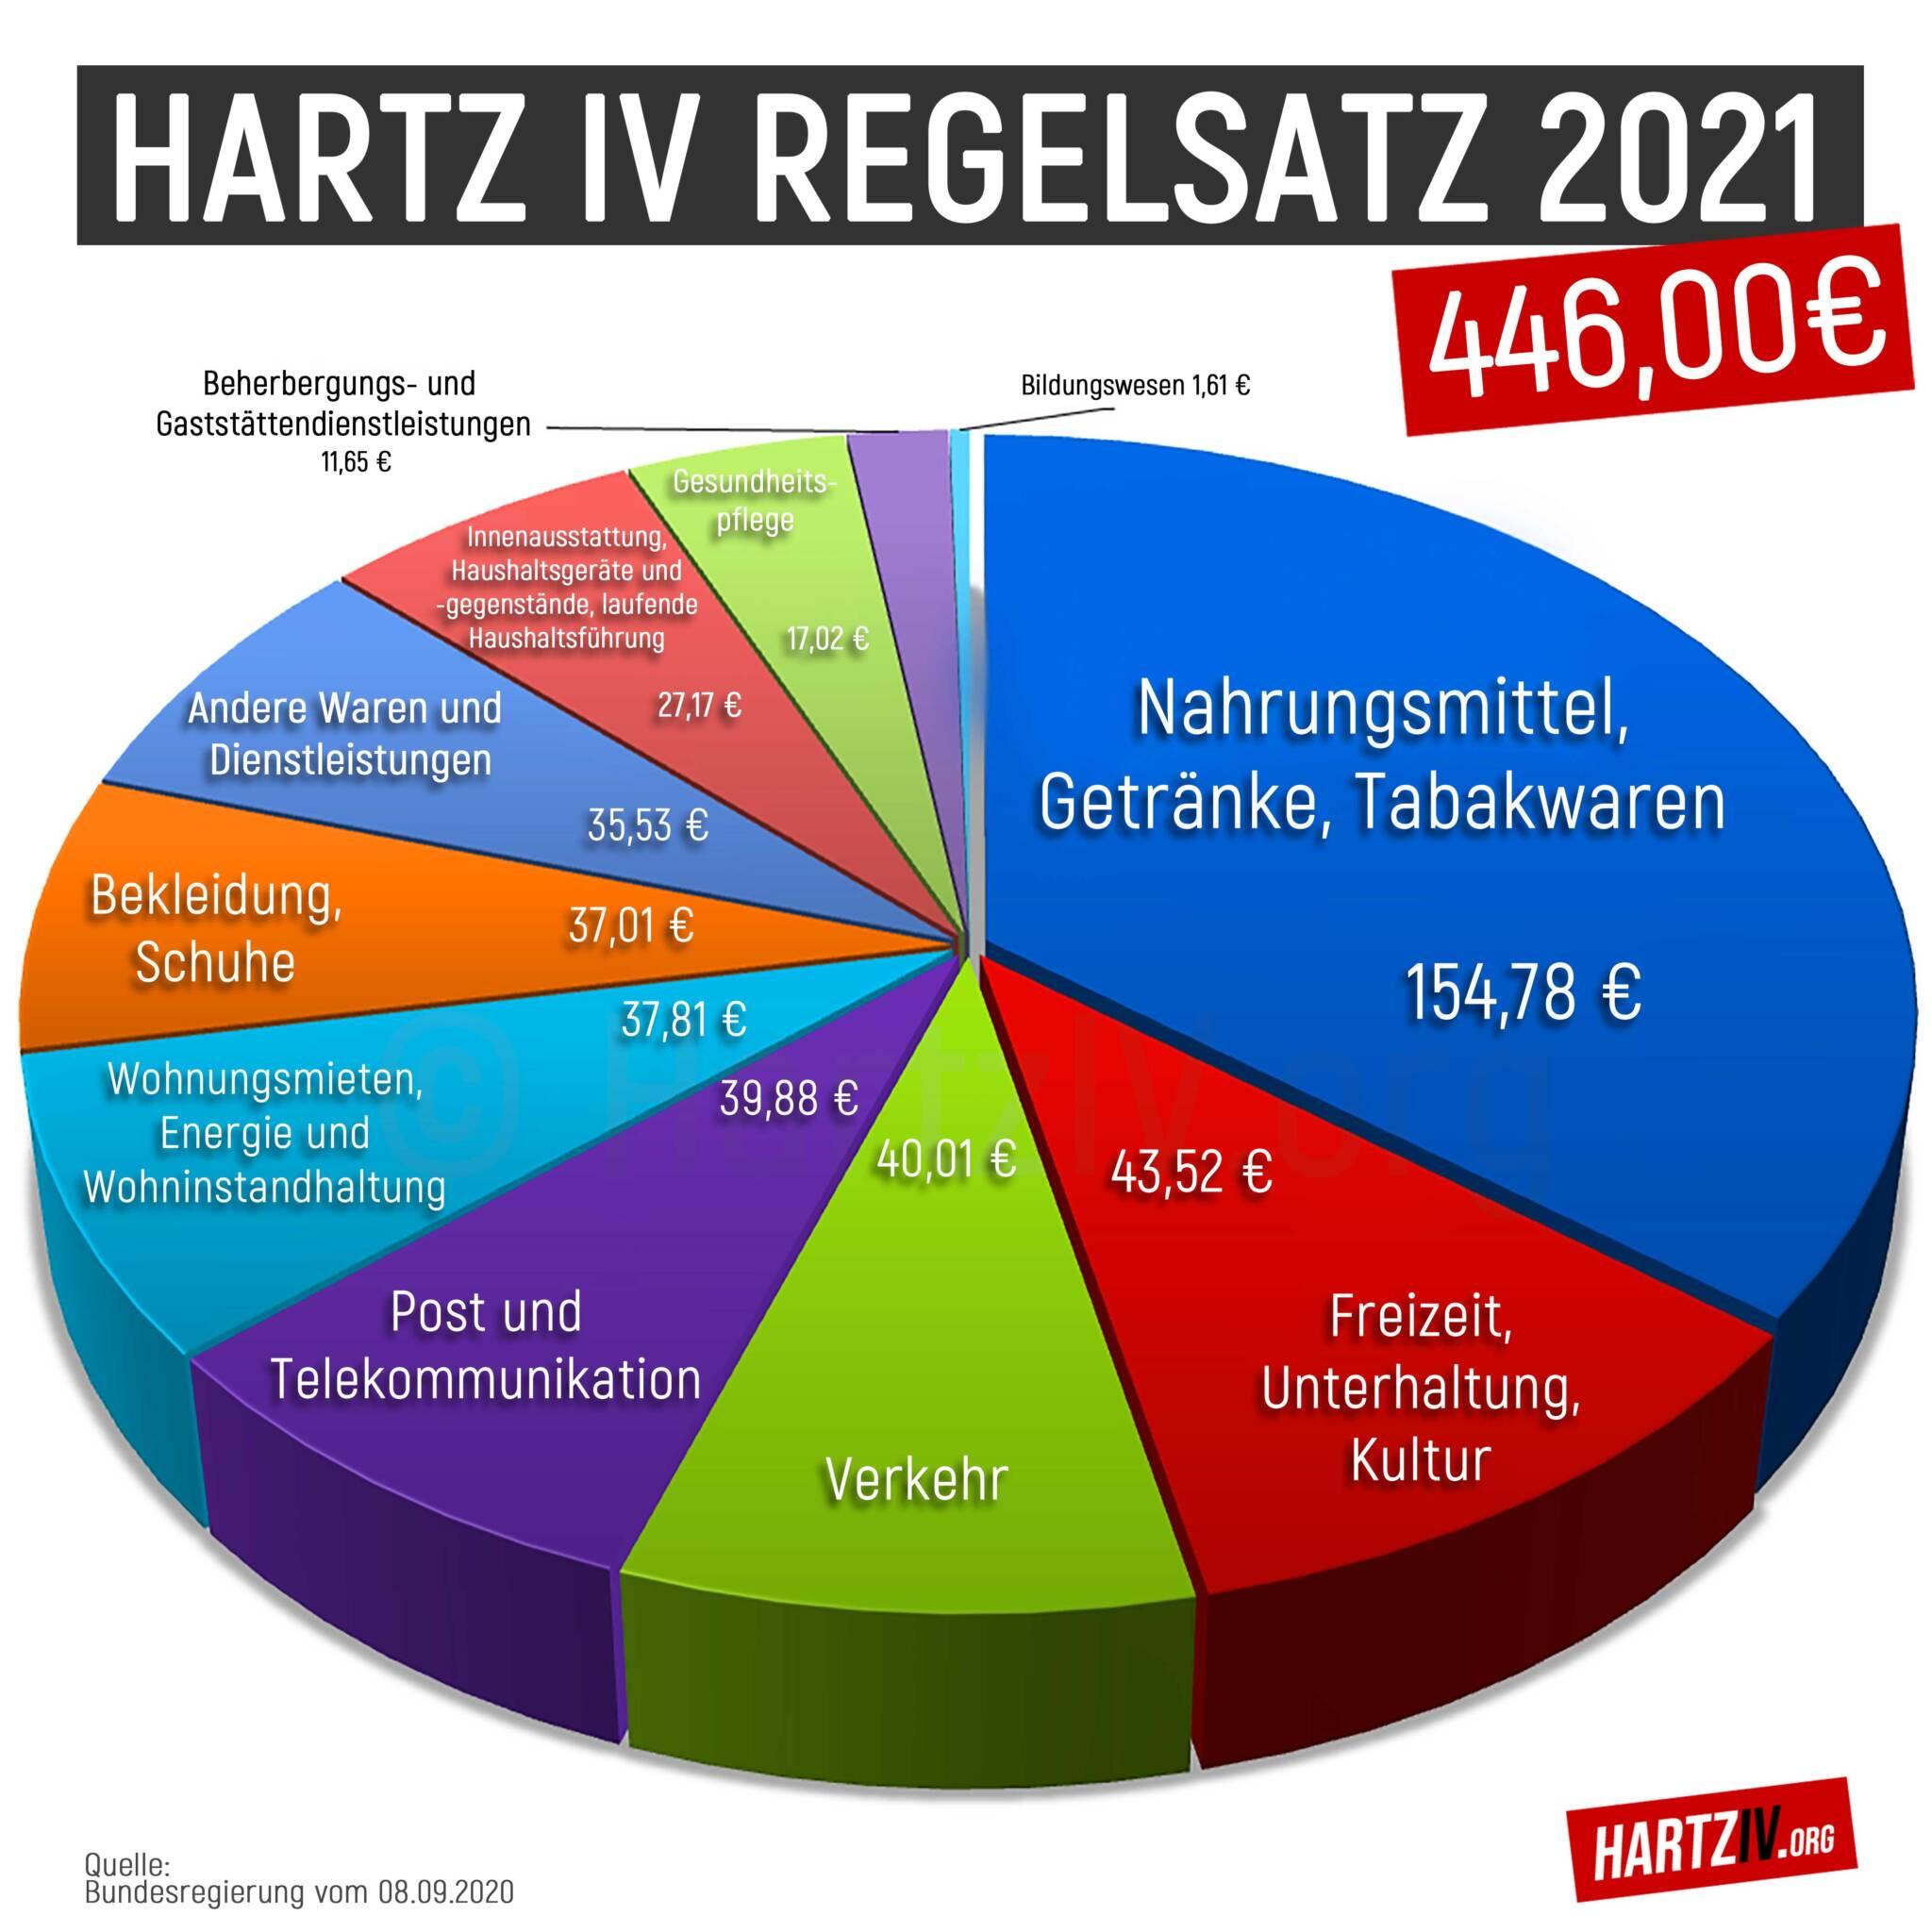 Single harz 4